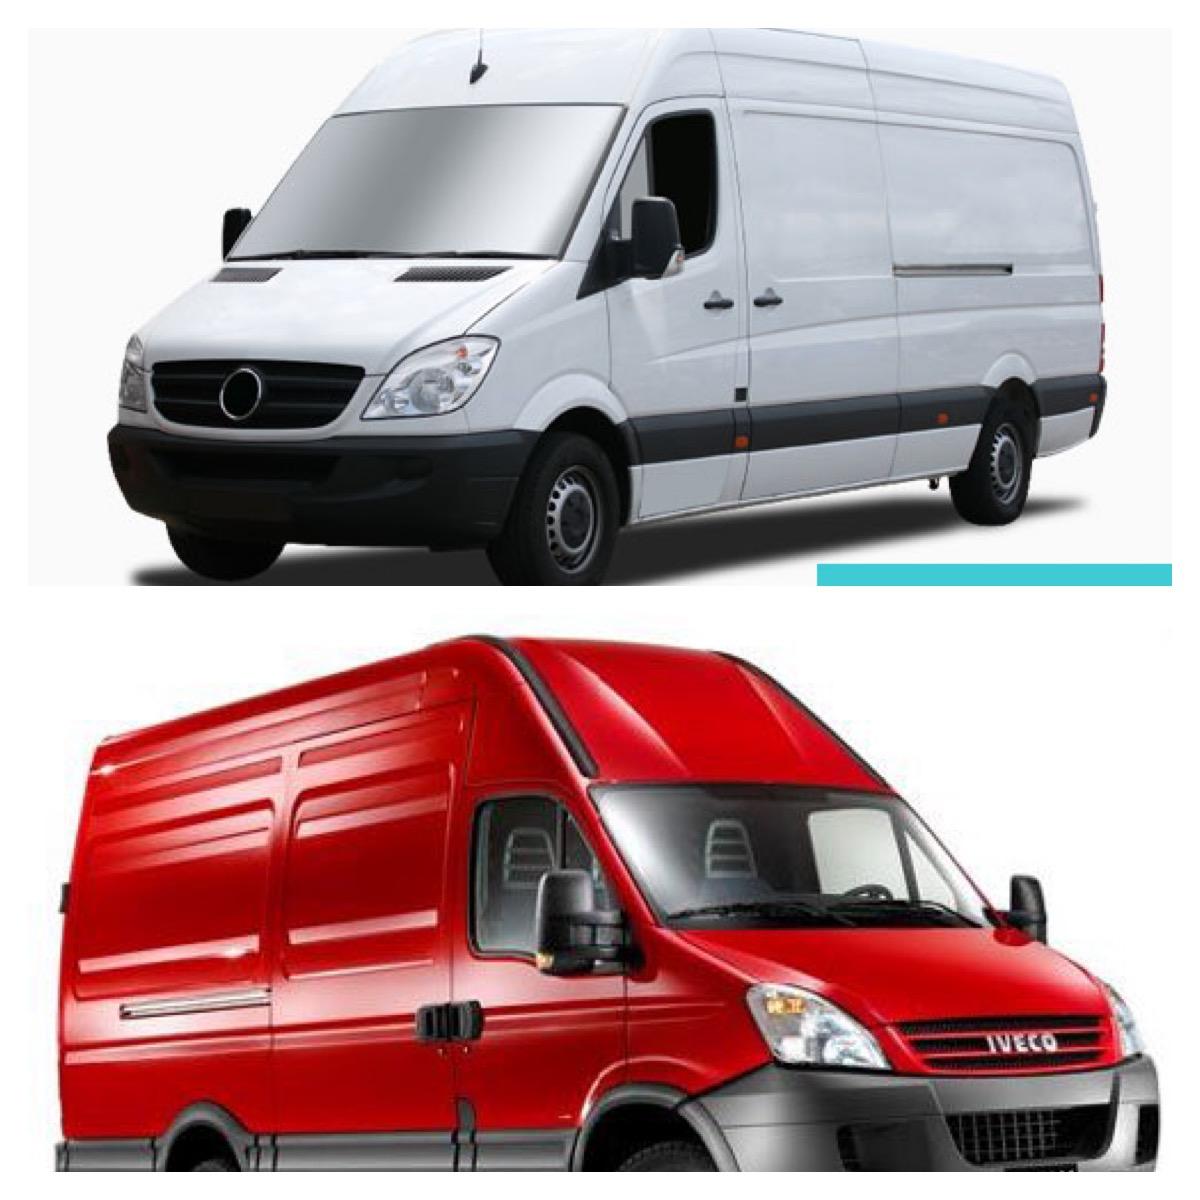 Vans Brighton